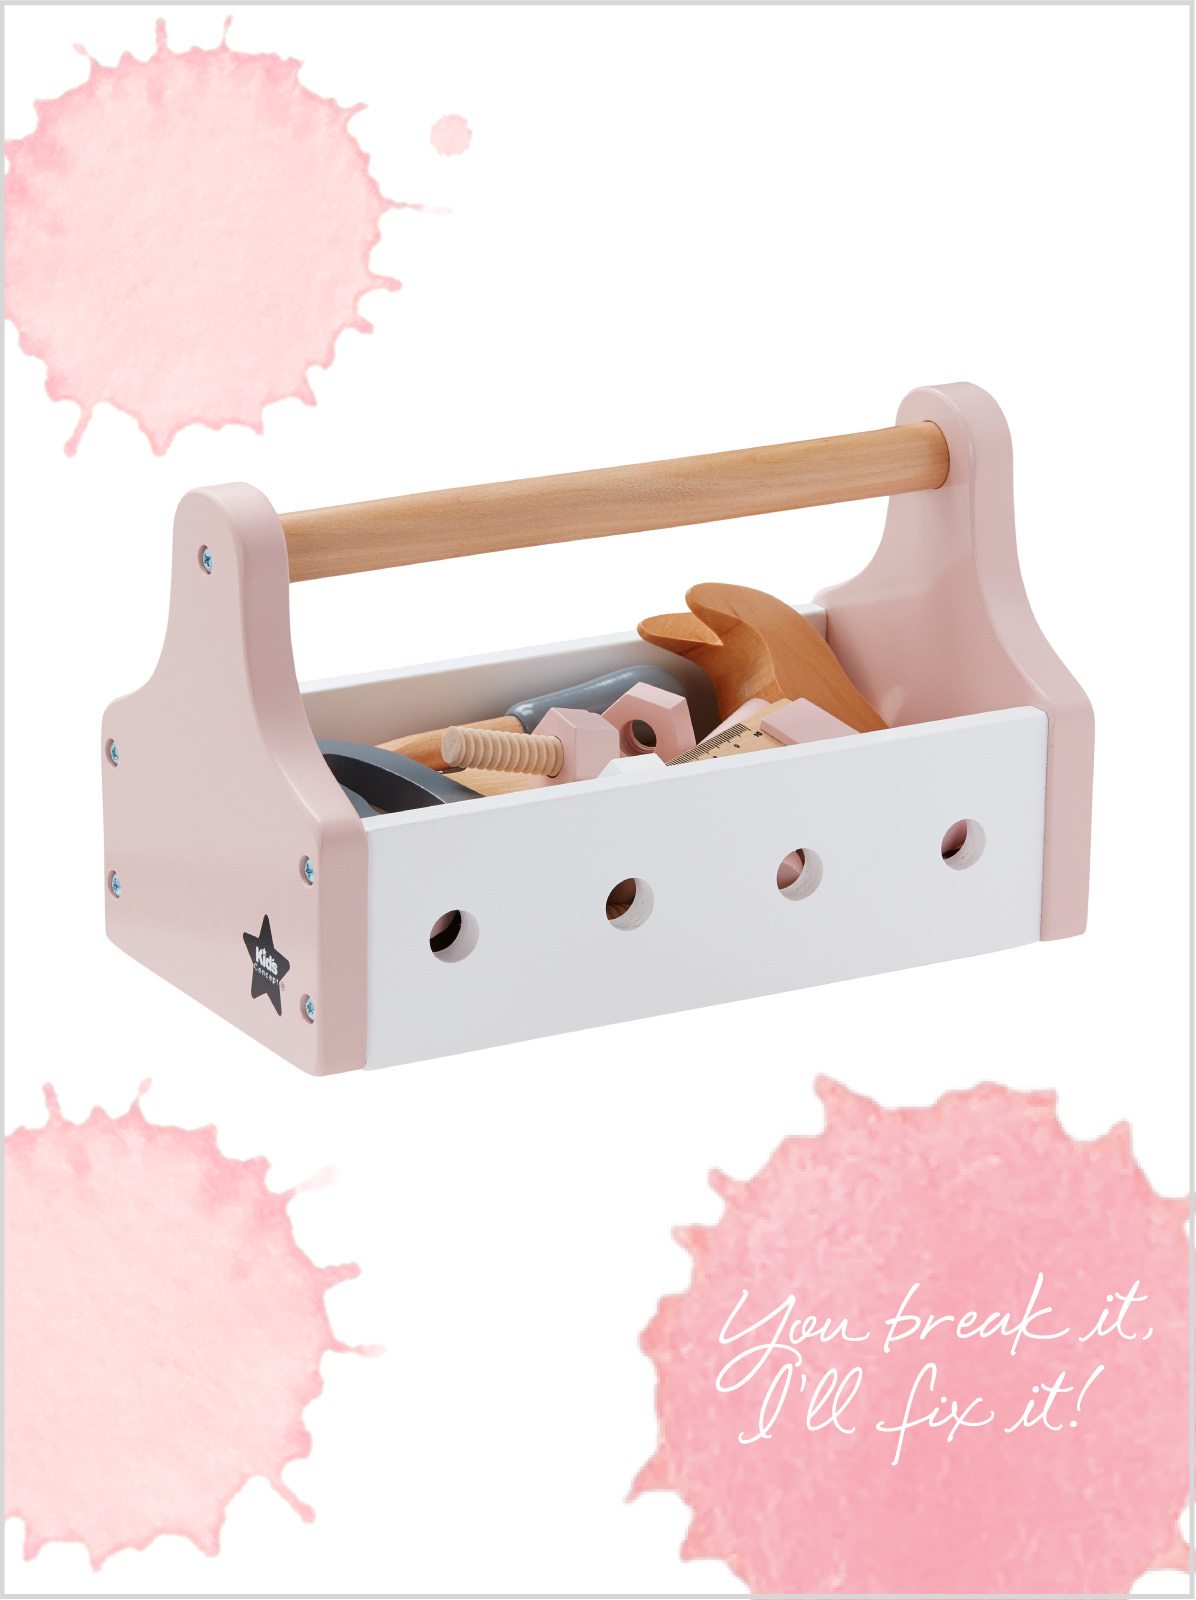 frederickandsophie-toys-kidsconcept-wooden-toolbox